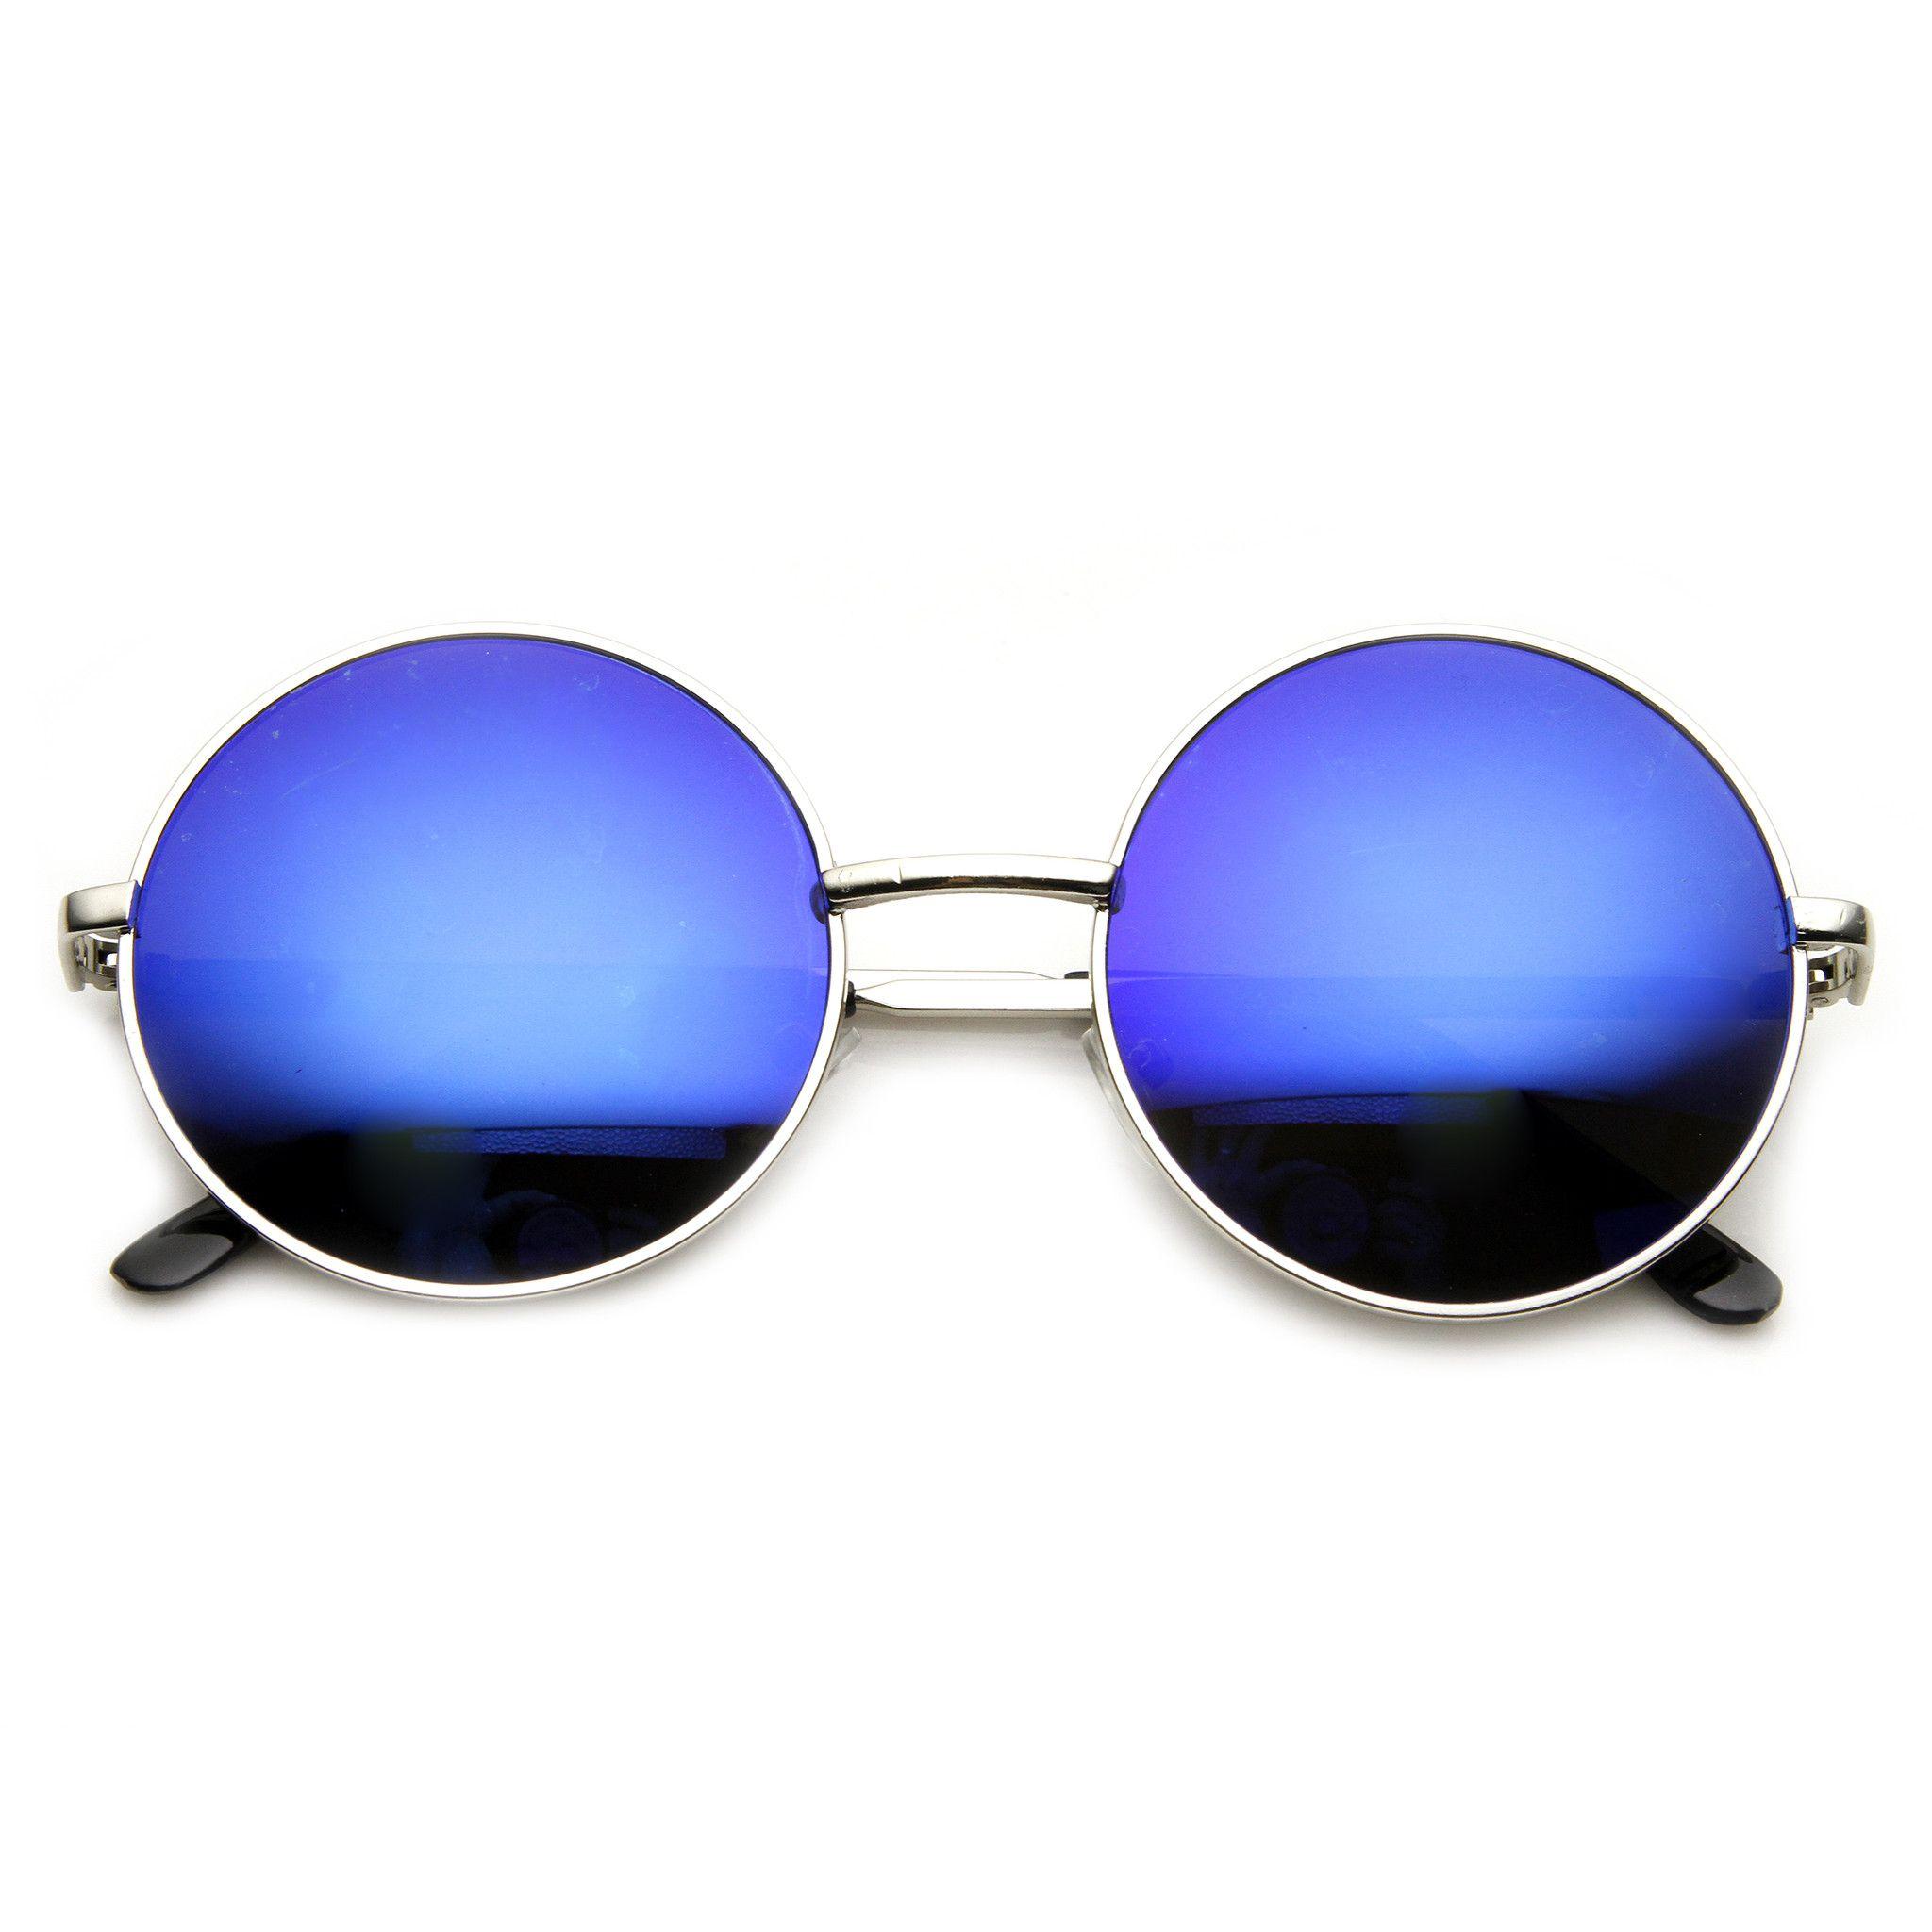 Metal Classic Round John Lennon Inspired Flash Mirrored Flat Lenses Sunglasses